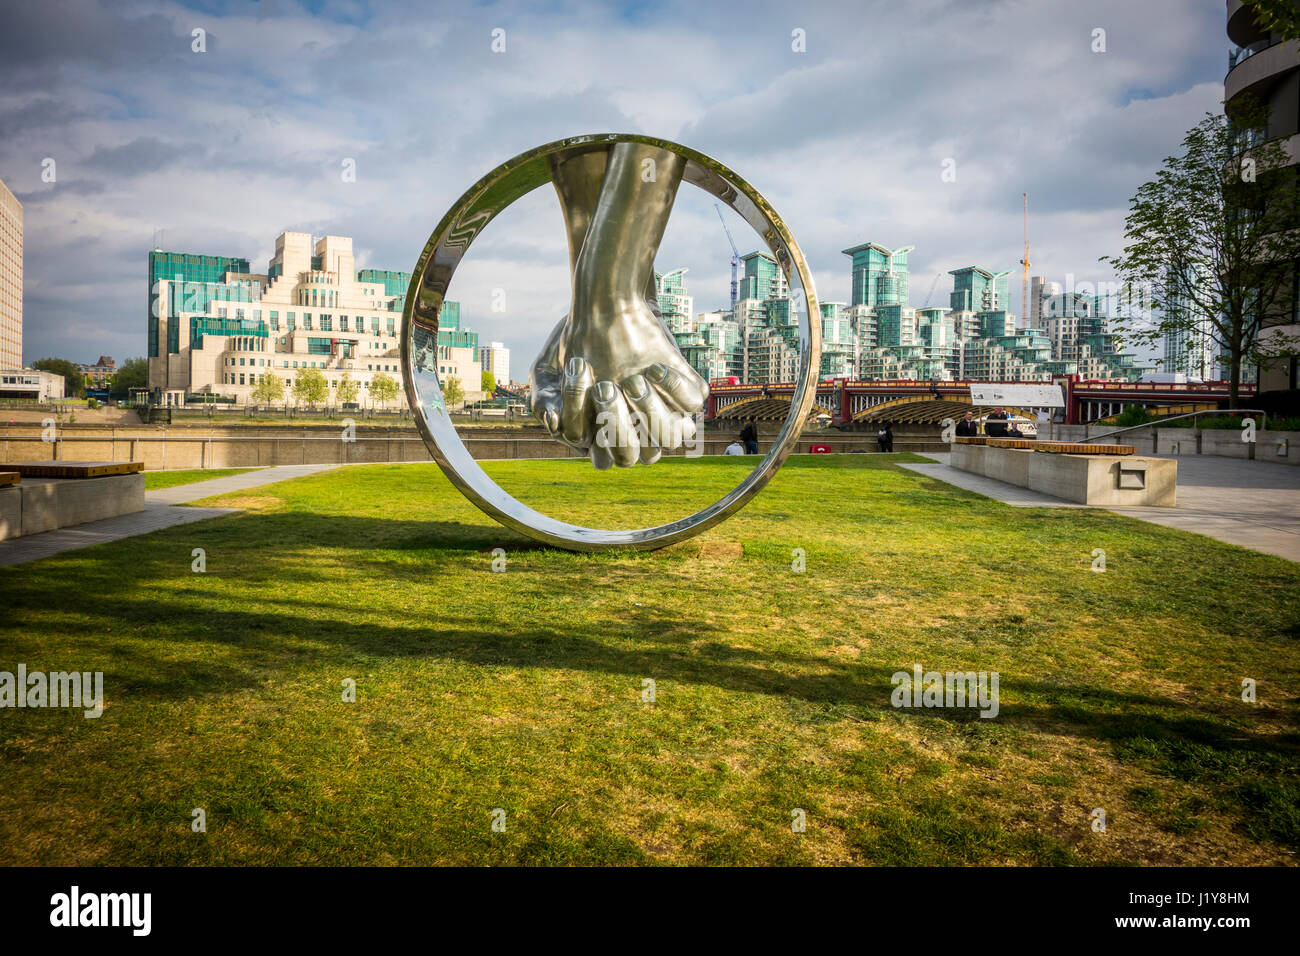 Lorenzo Quinn sculpture 'Love, Aluminium' Riverside Walk Gardens, Milbank, London, UK - Stock Image